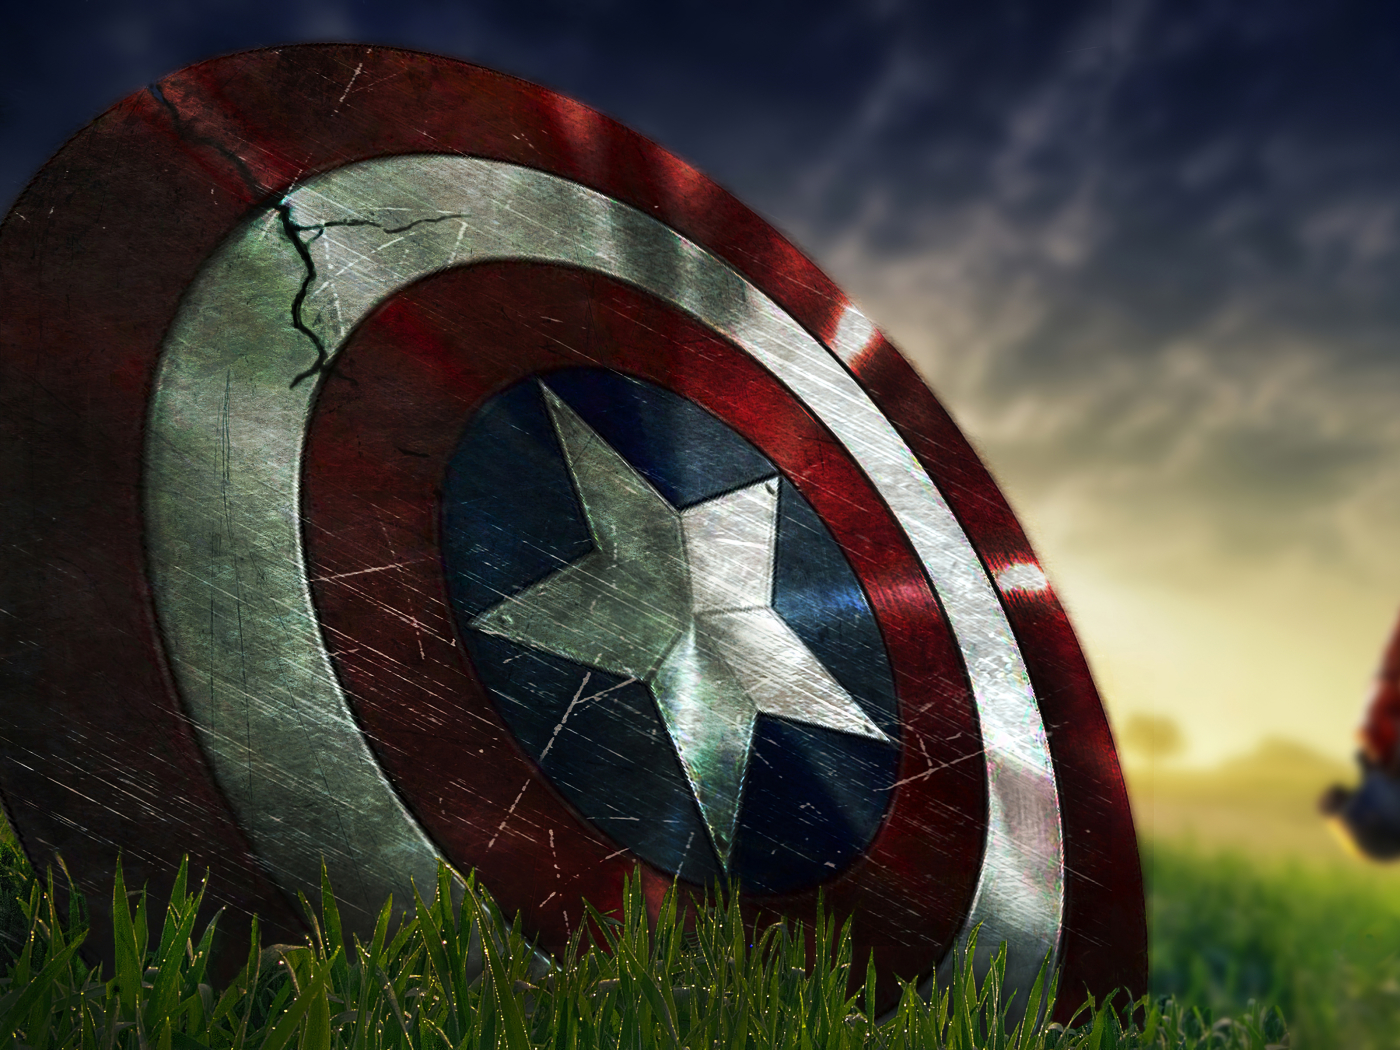 1400x1050 Captain America Shield Fortnite 1400x1050 ...